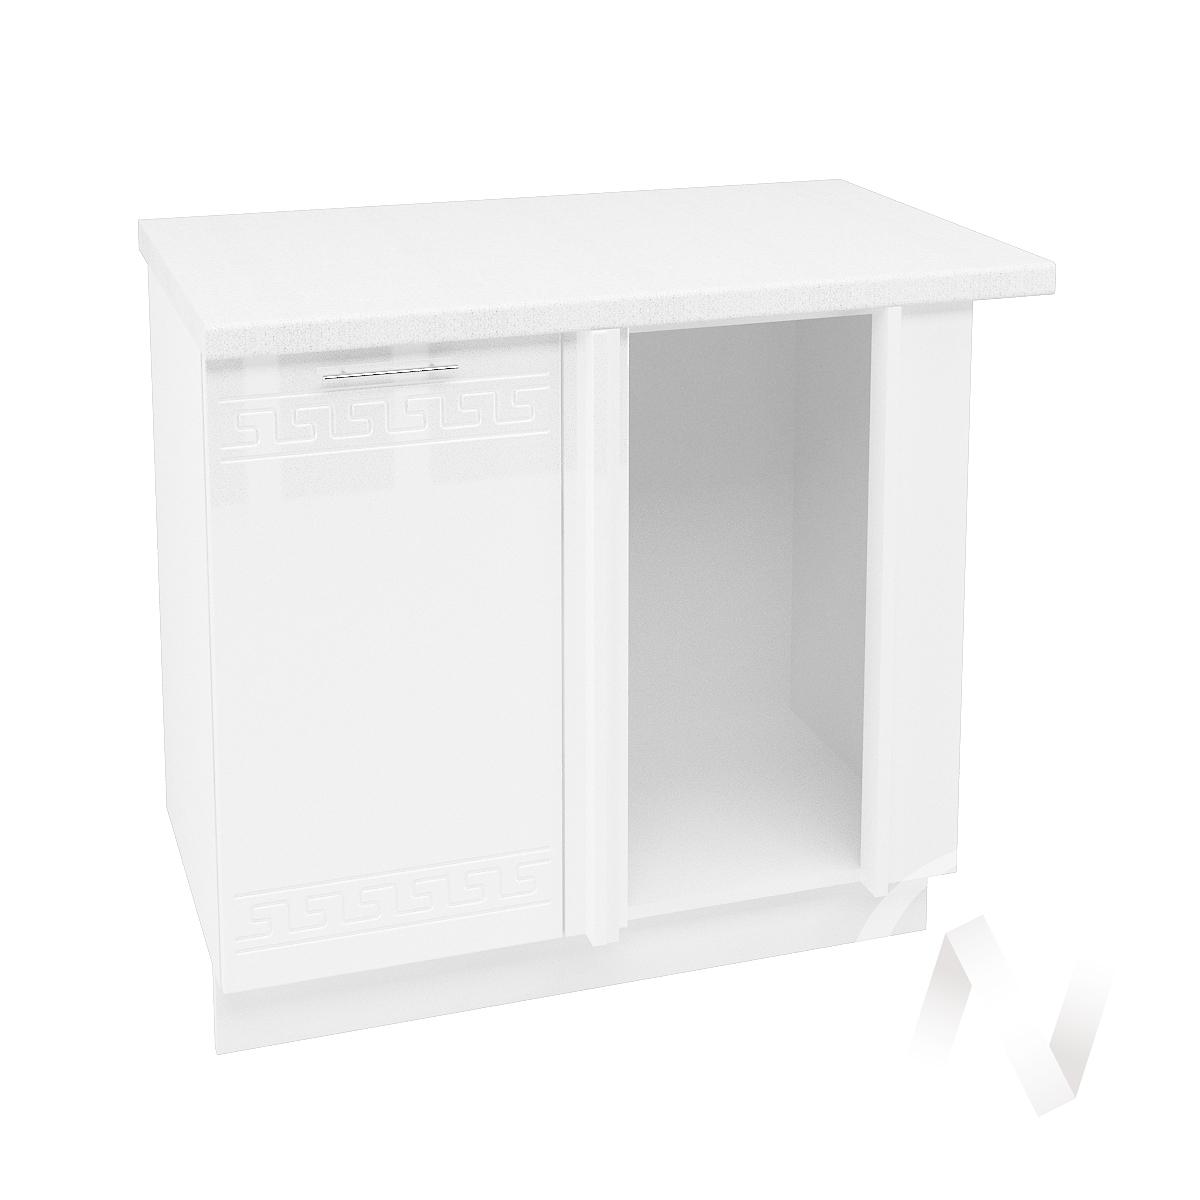 "Кухня ""Греция"": Шкаф нижний угловой 990М, ШНУ 990М (белый металлик/корпус белый)"